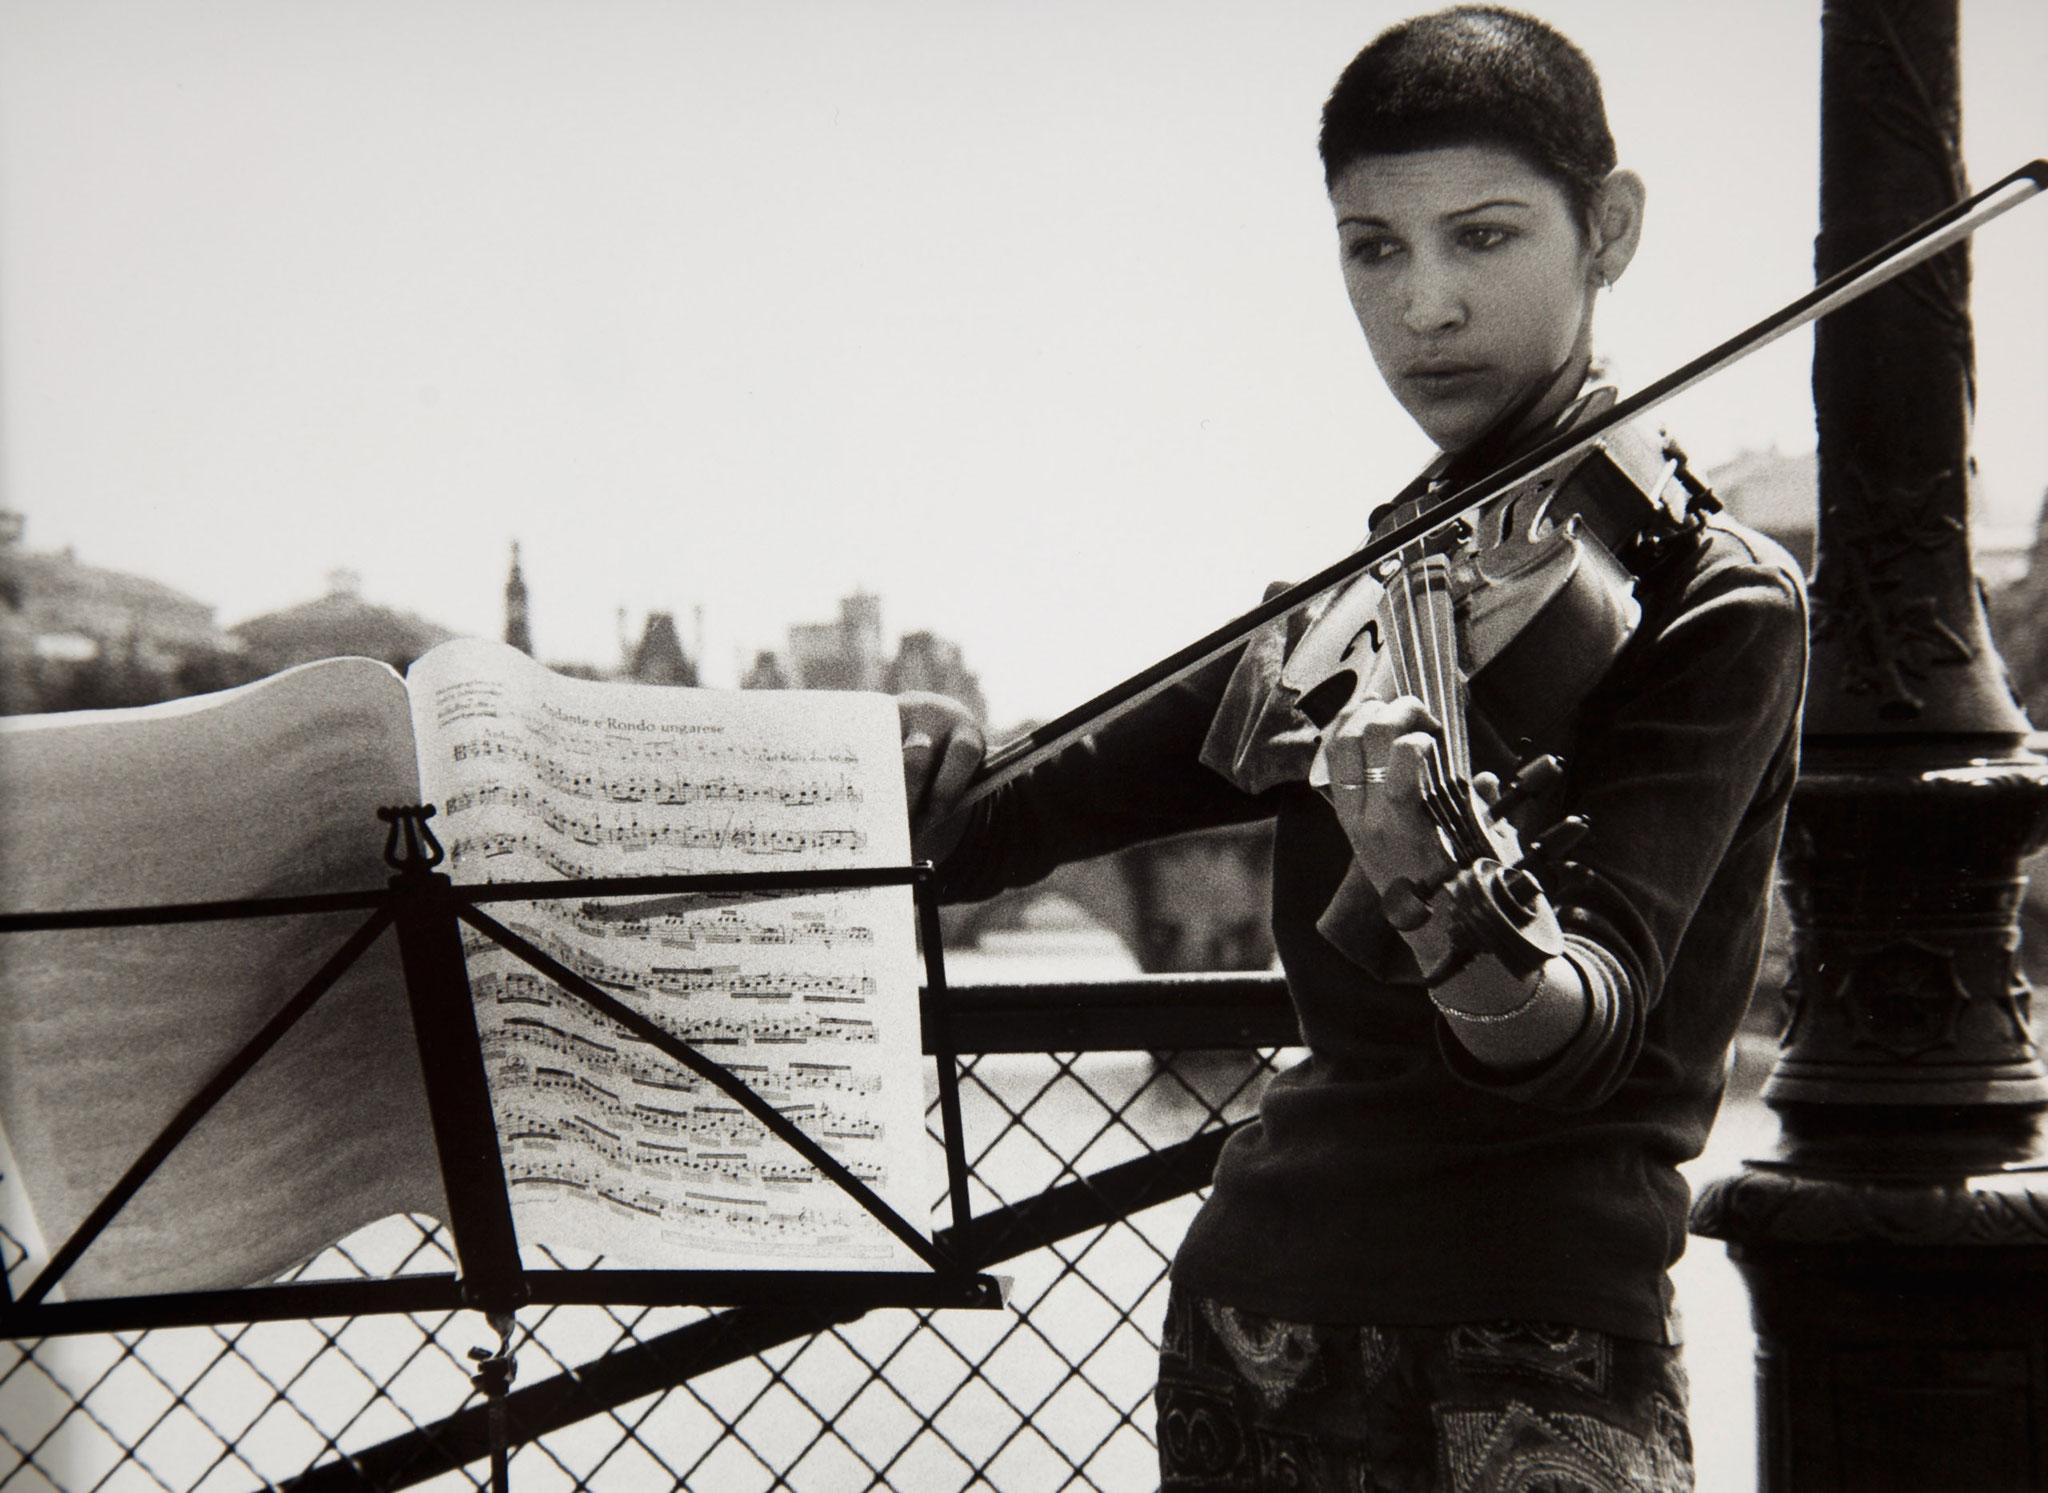 Strassenmusikantin, Paris